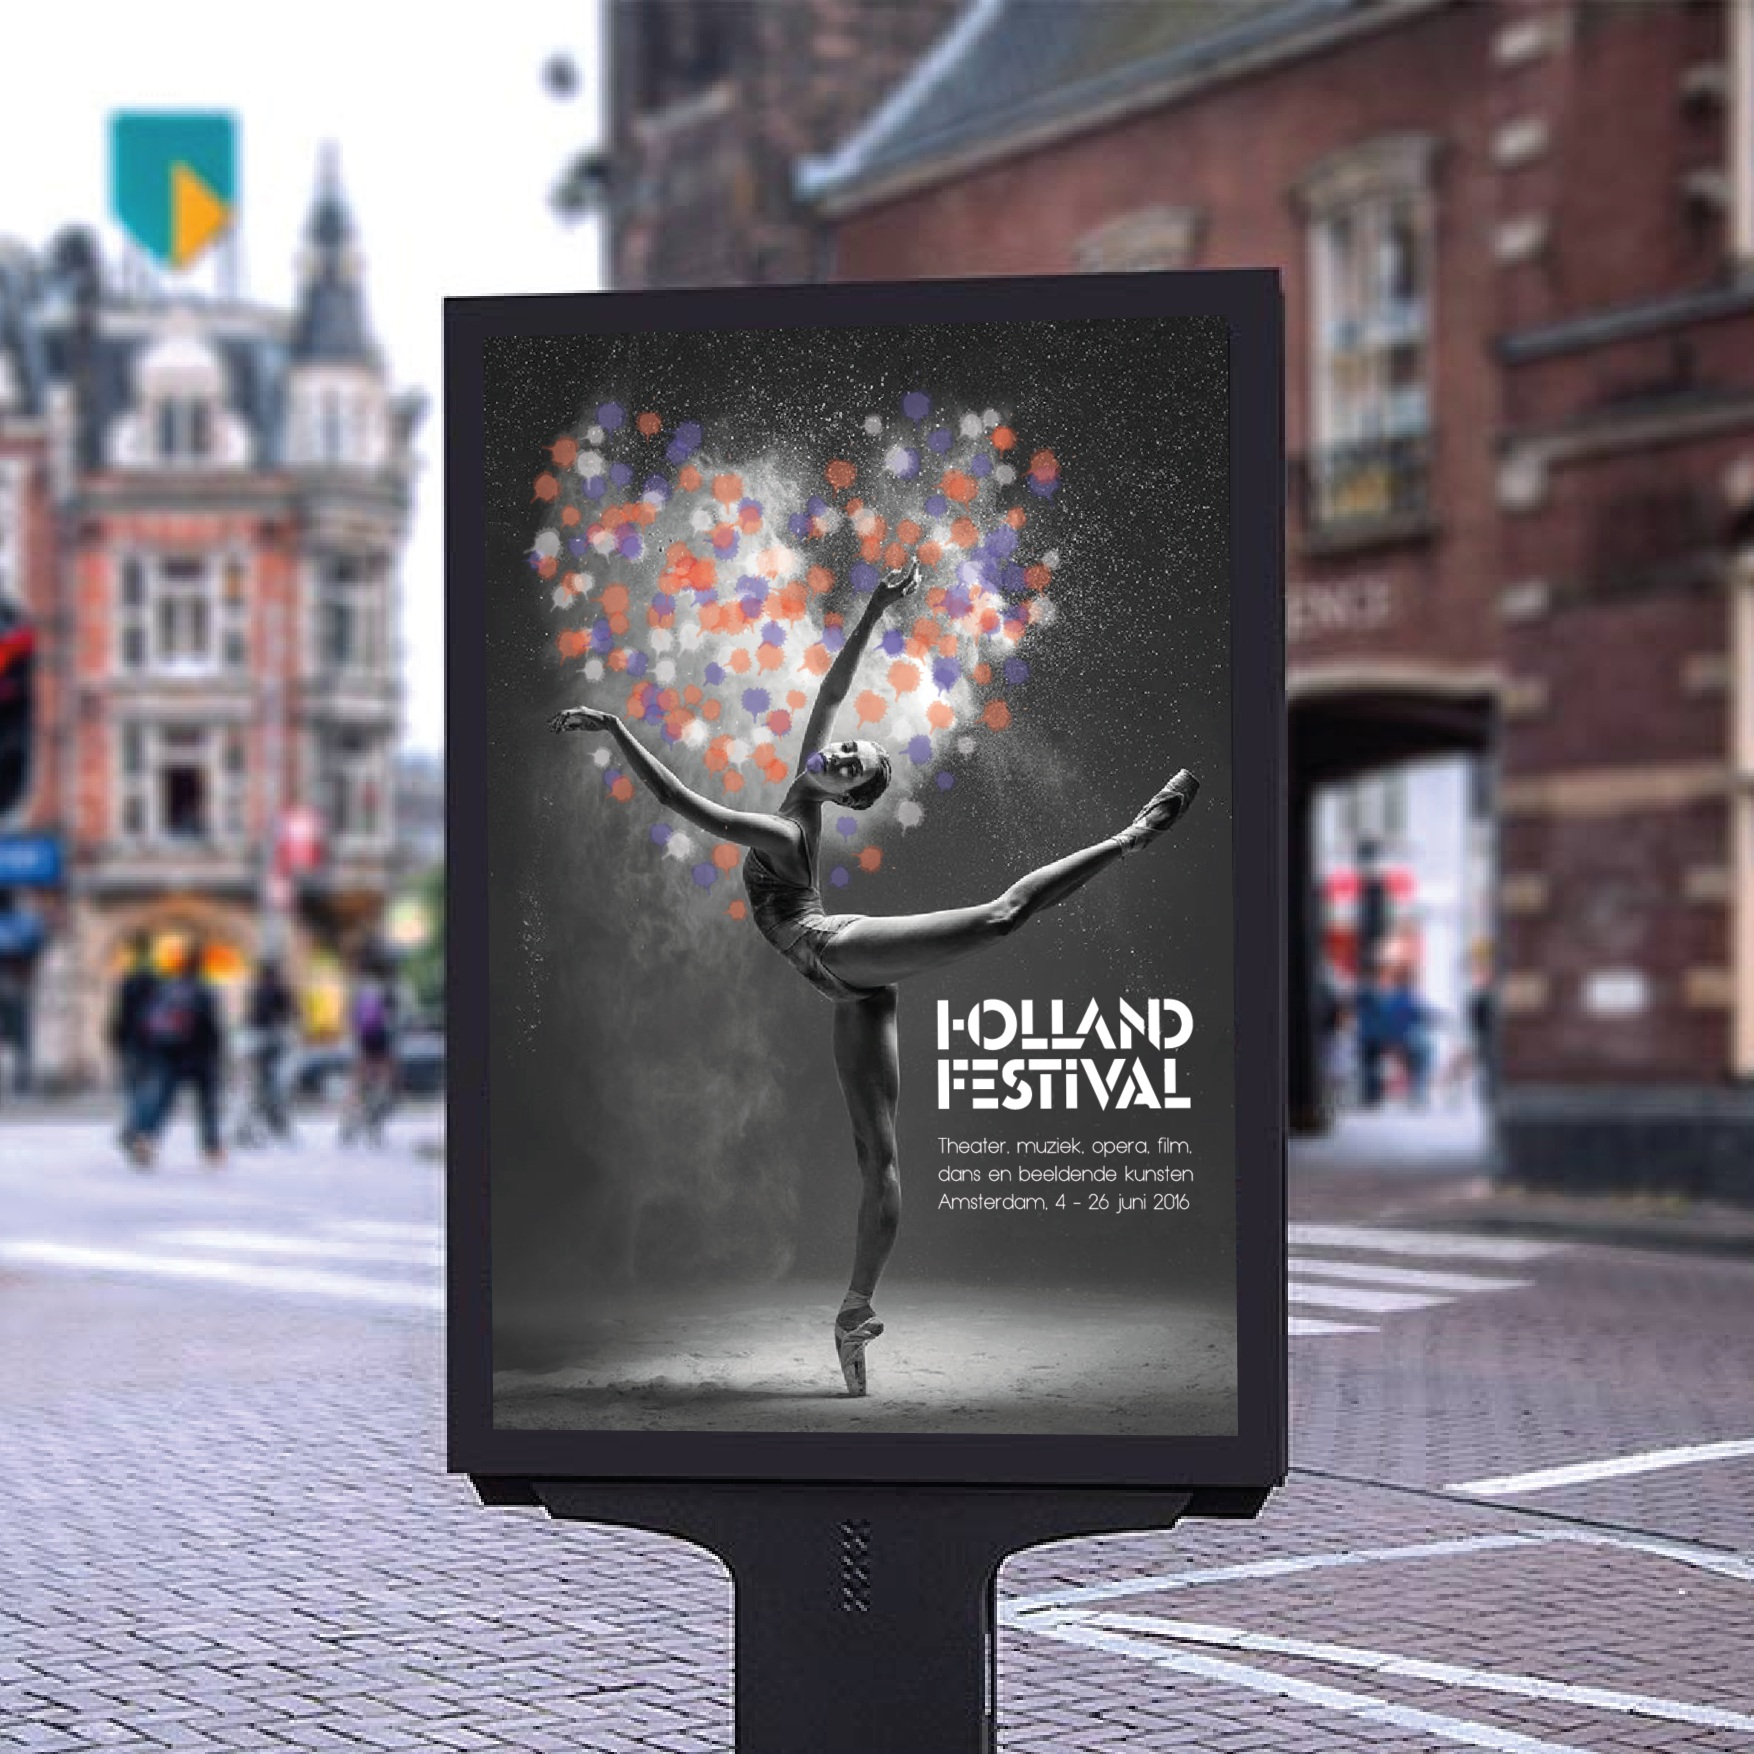 Holland+Festival+openingsvisual+kleiner-01.jpg